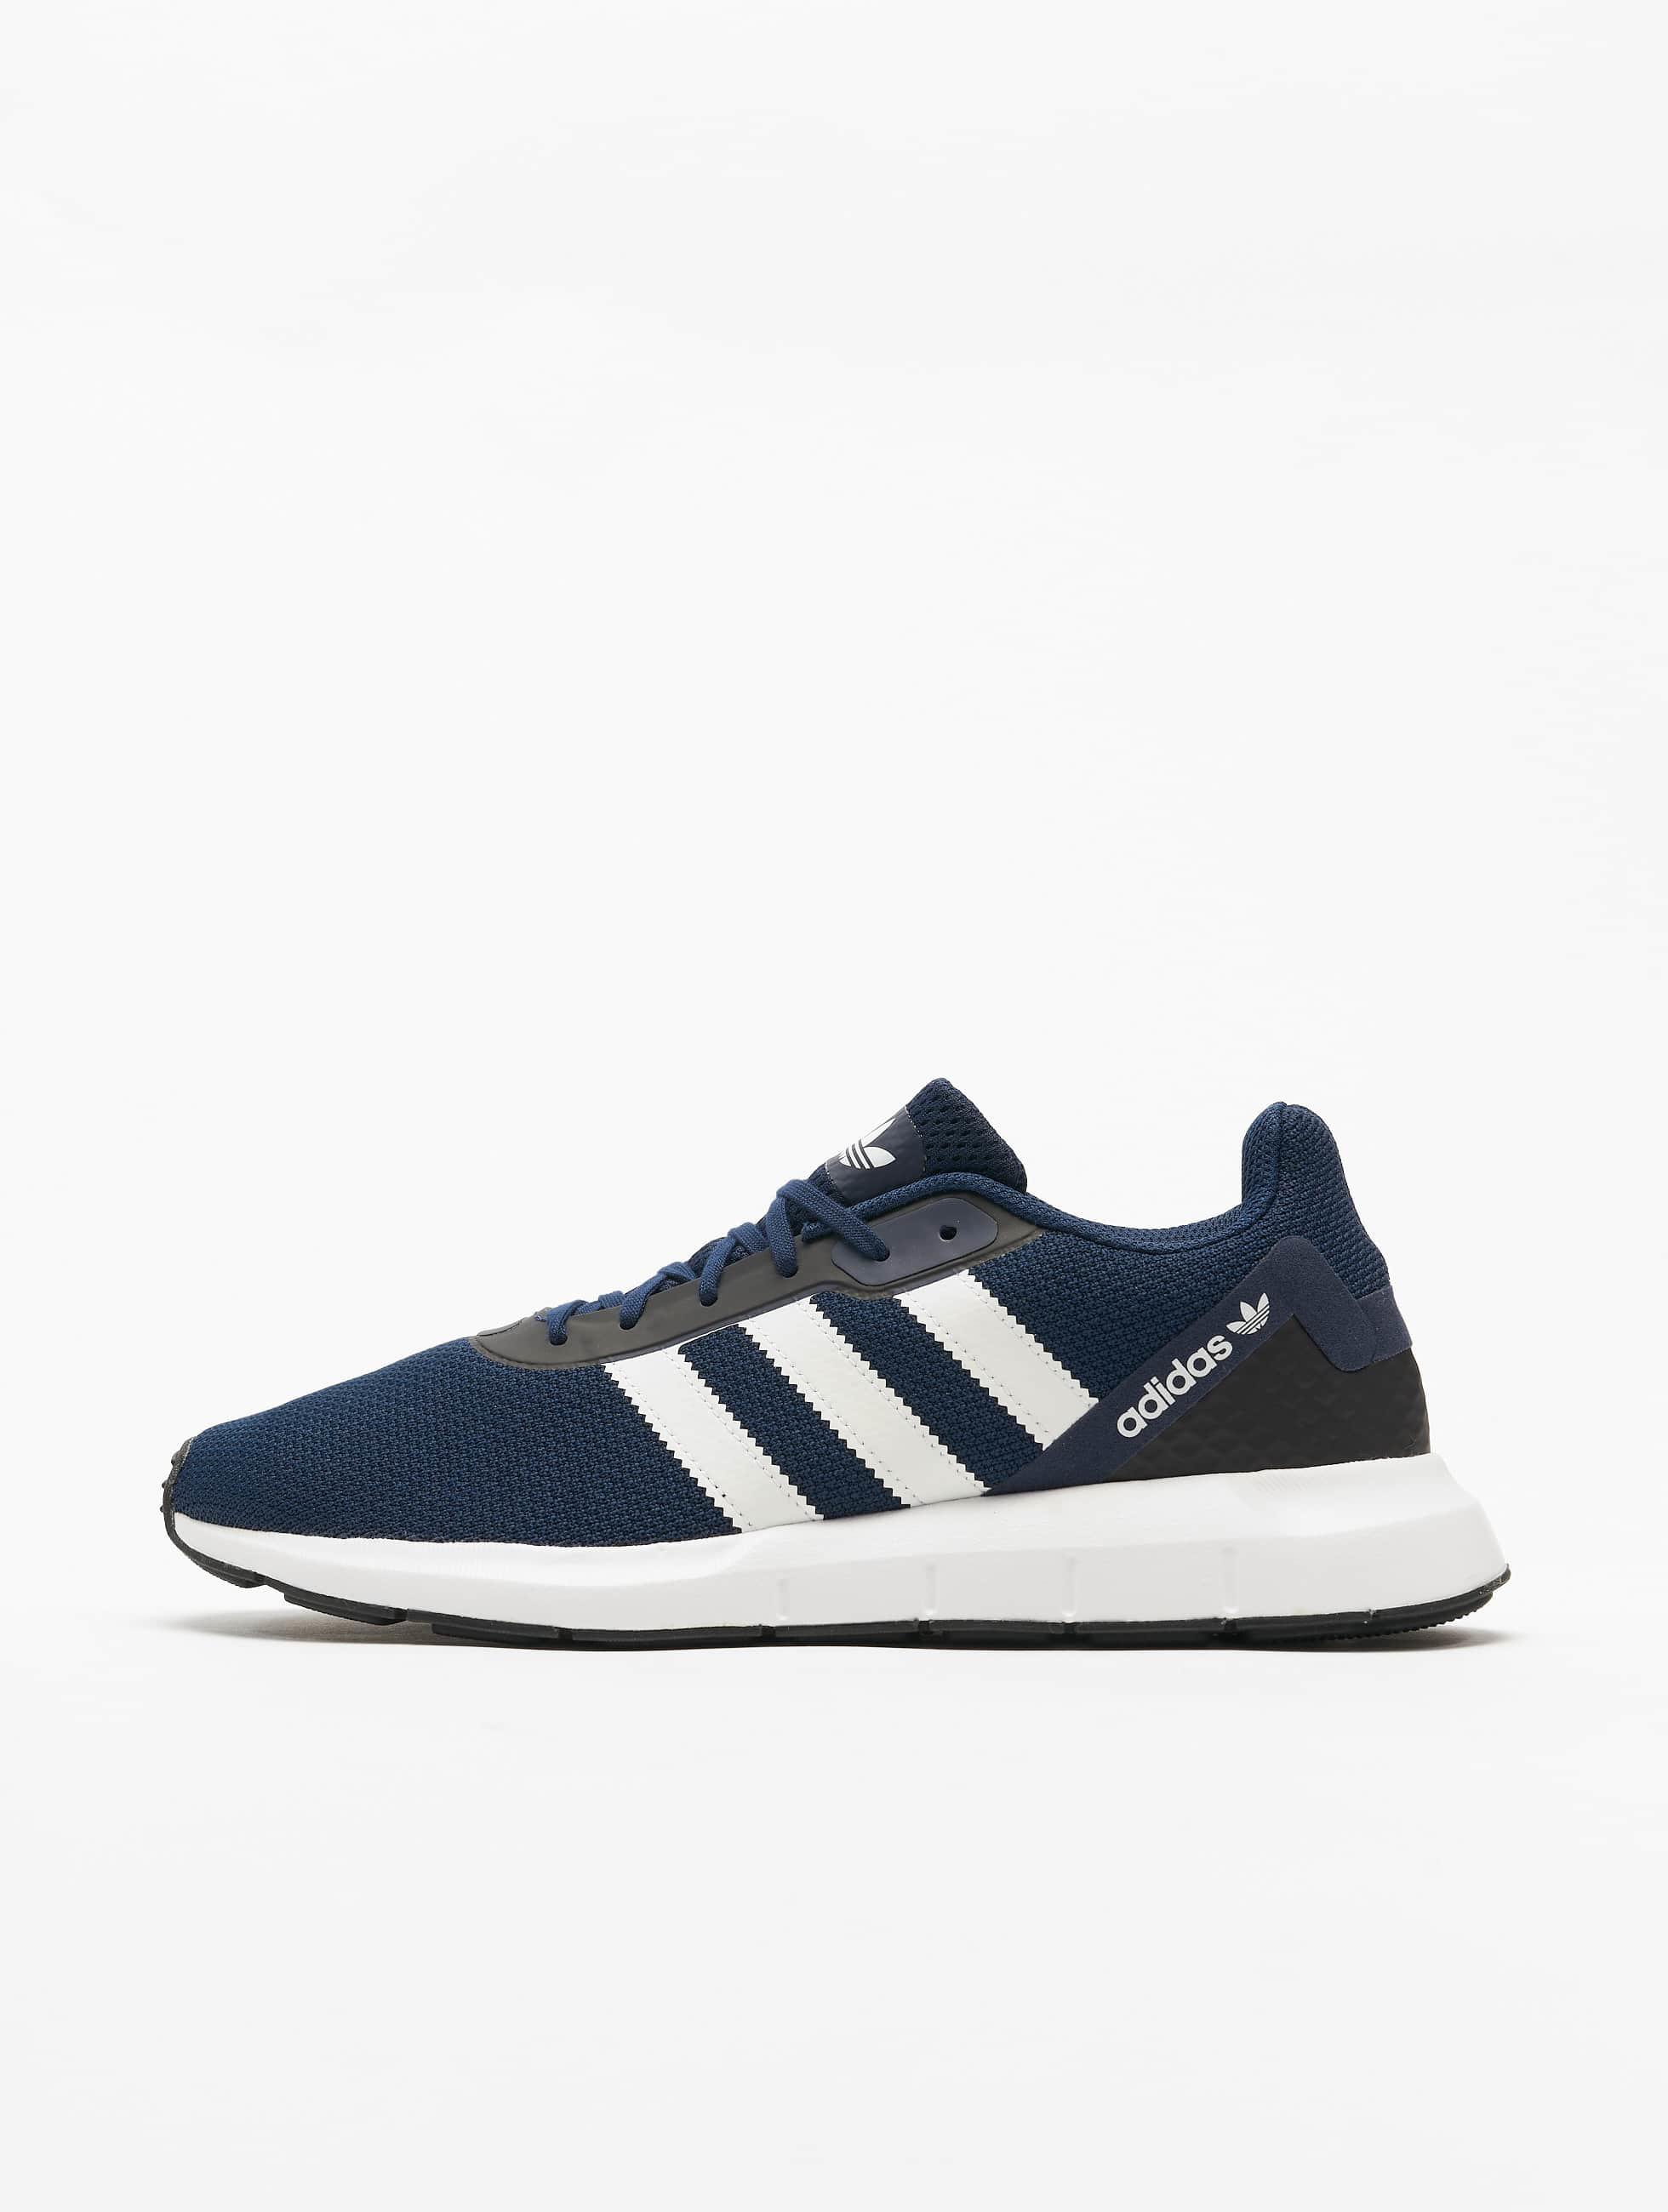 Adidas Originals Swift Run RF Sneakers Collegiate NavyFtwr WhiteCore Black